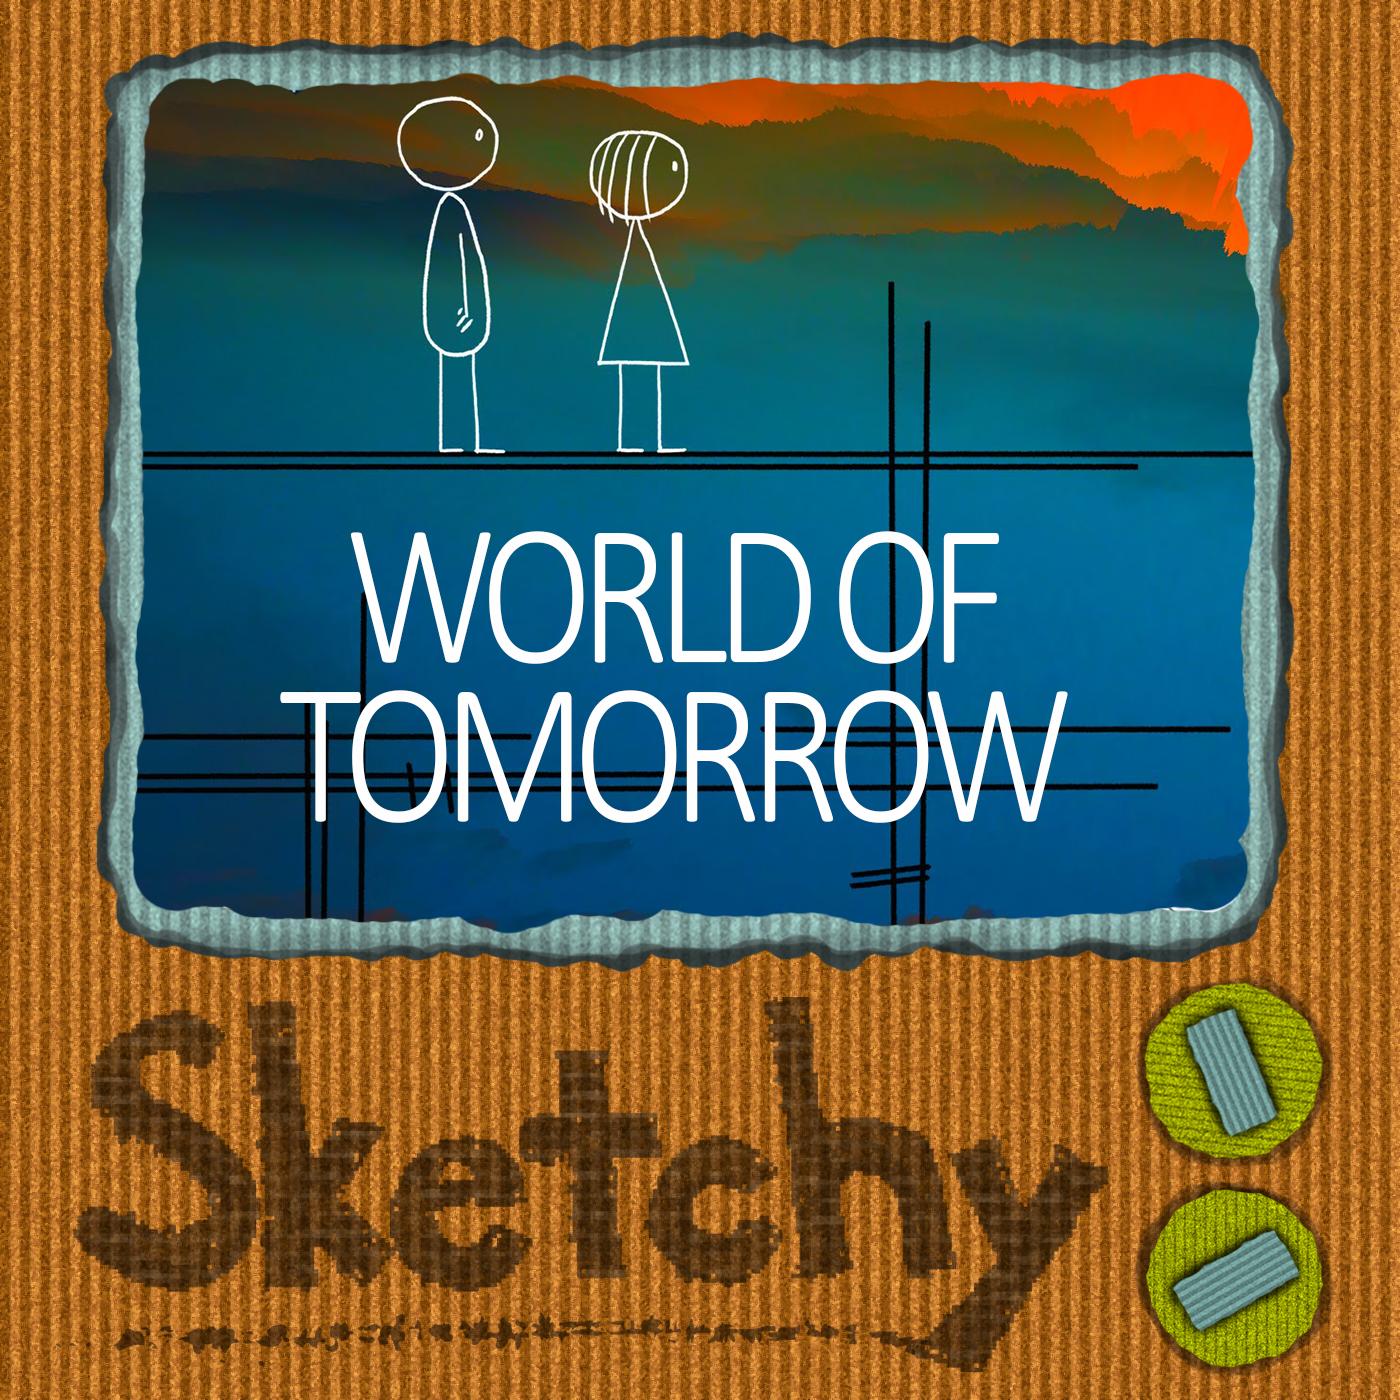 Episode 229 - World of Tomorrow